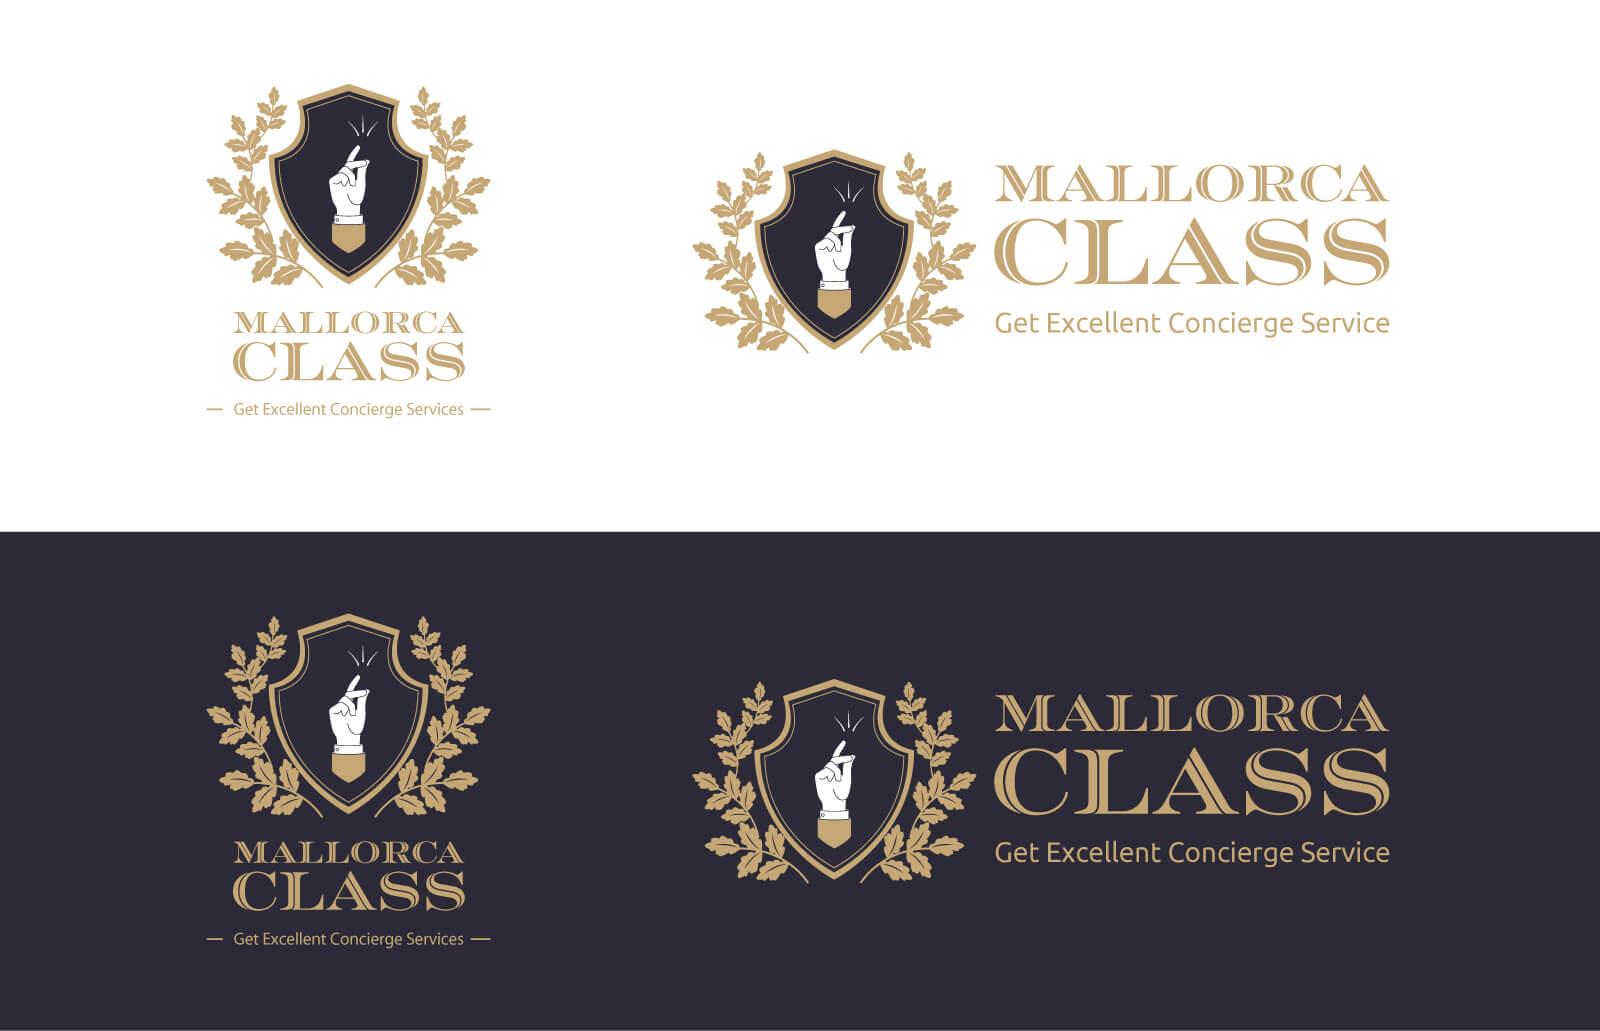 mallorca-class-desarrollo-marca